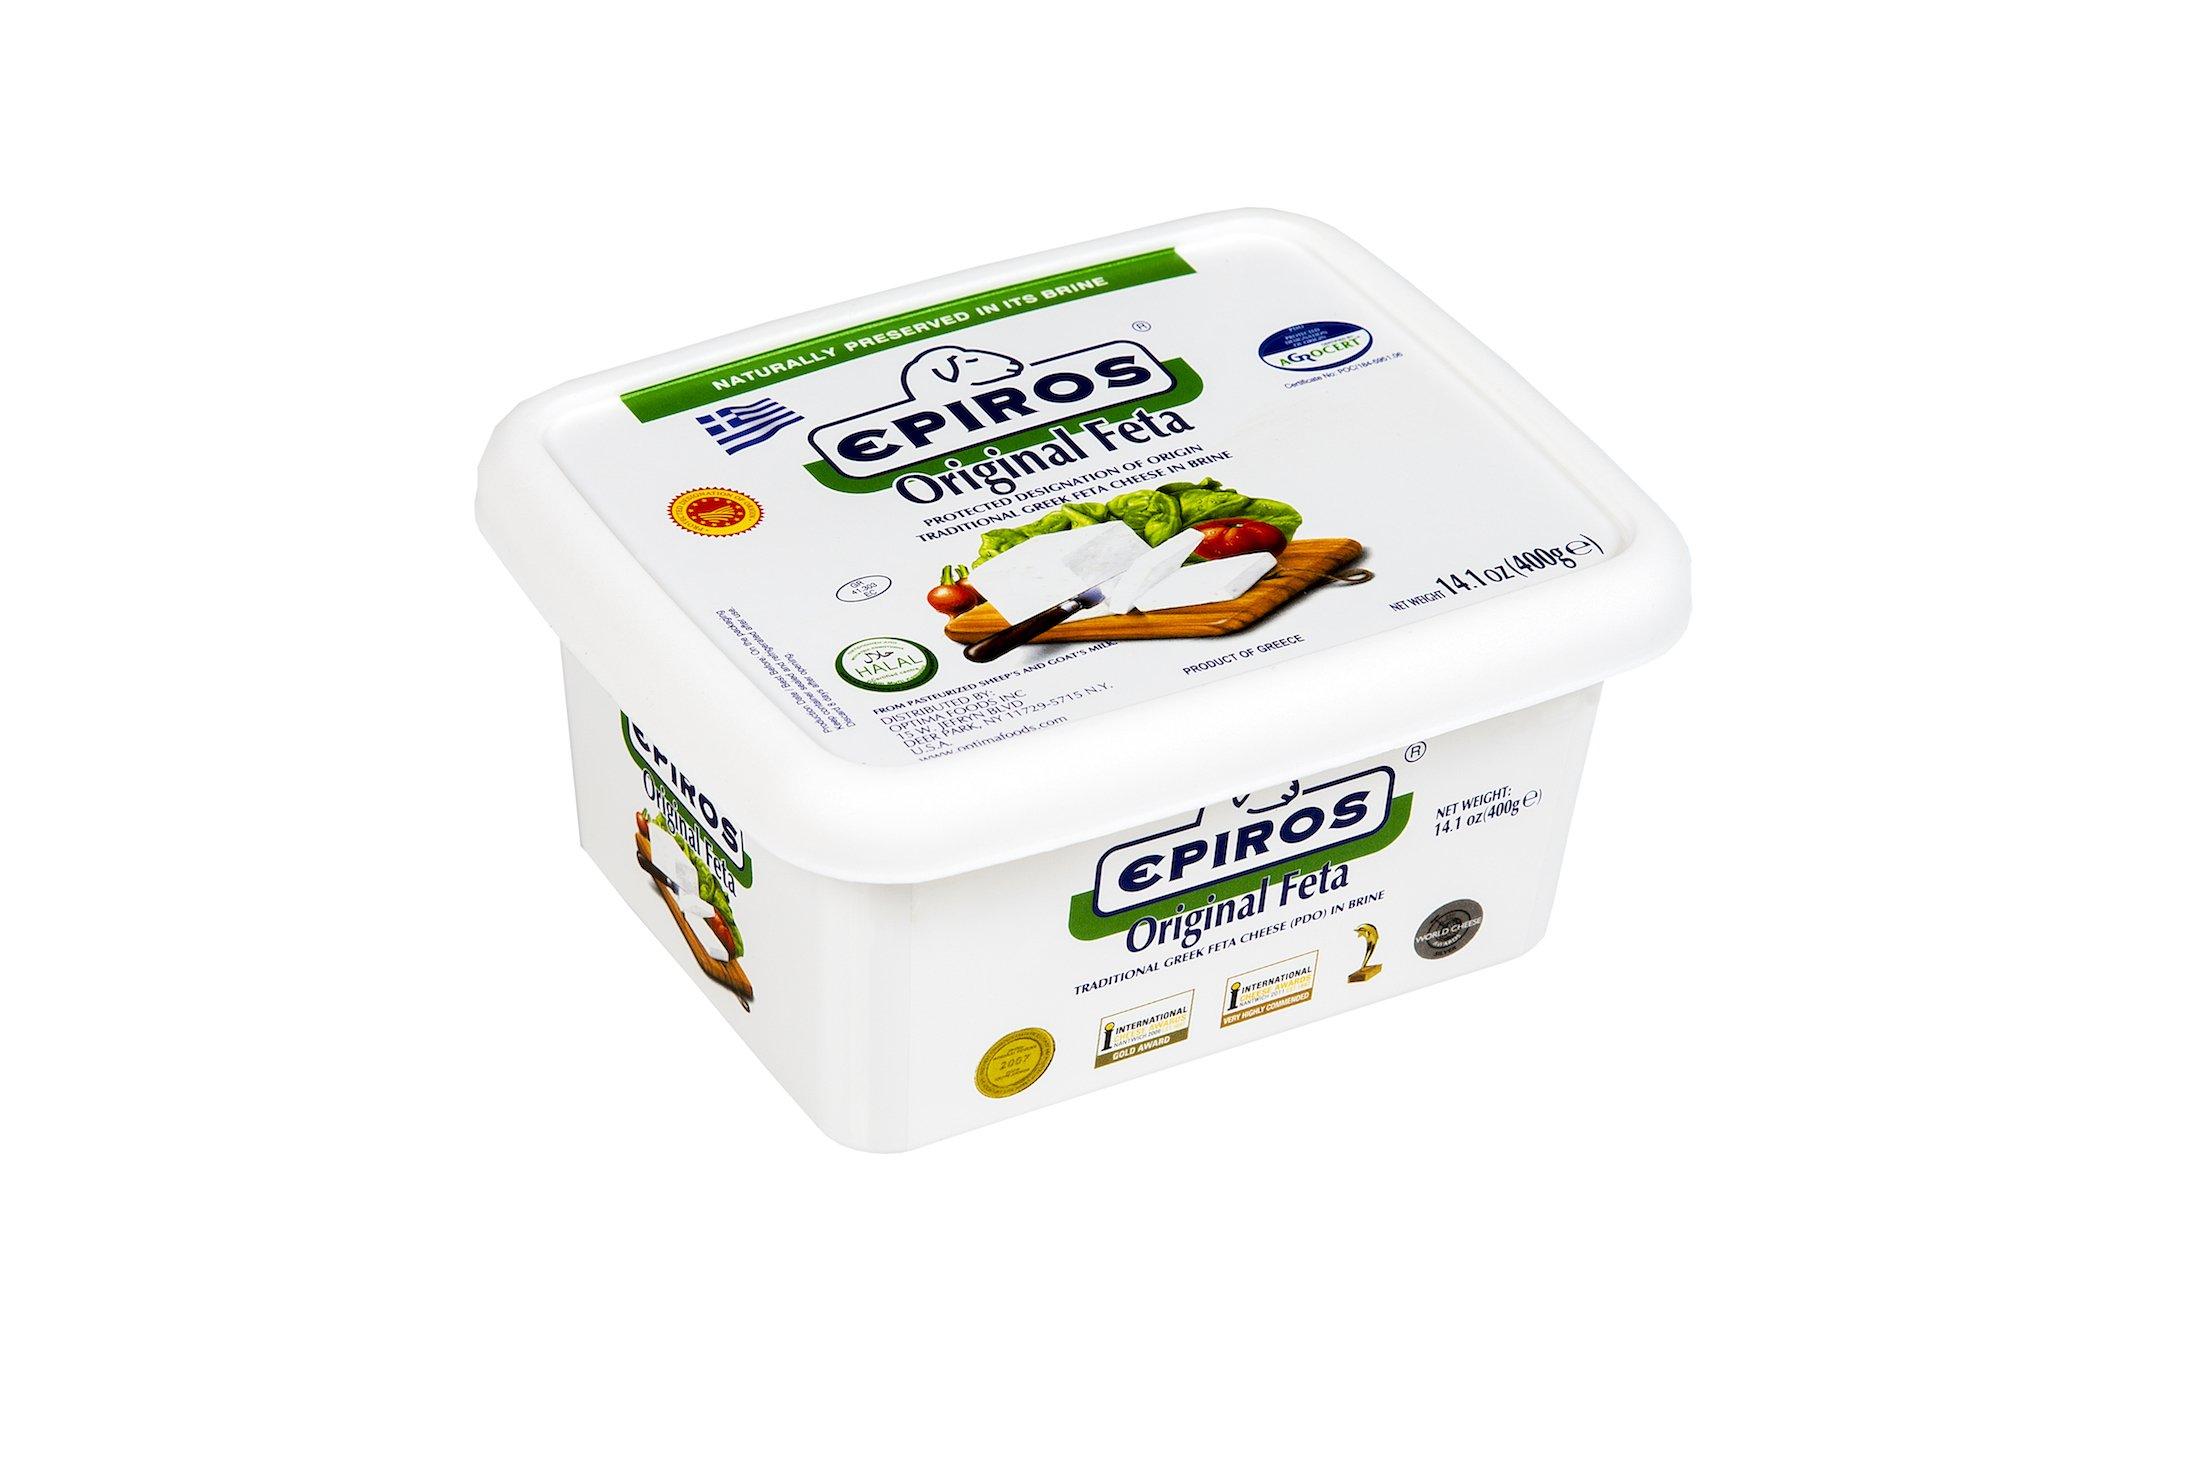 Epiros Original Feta Packed in Brine - 14 oz